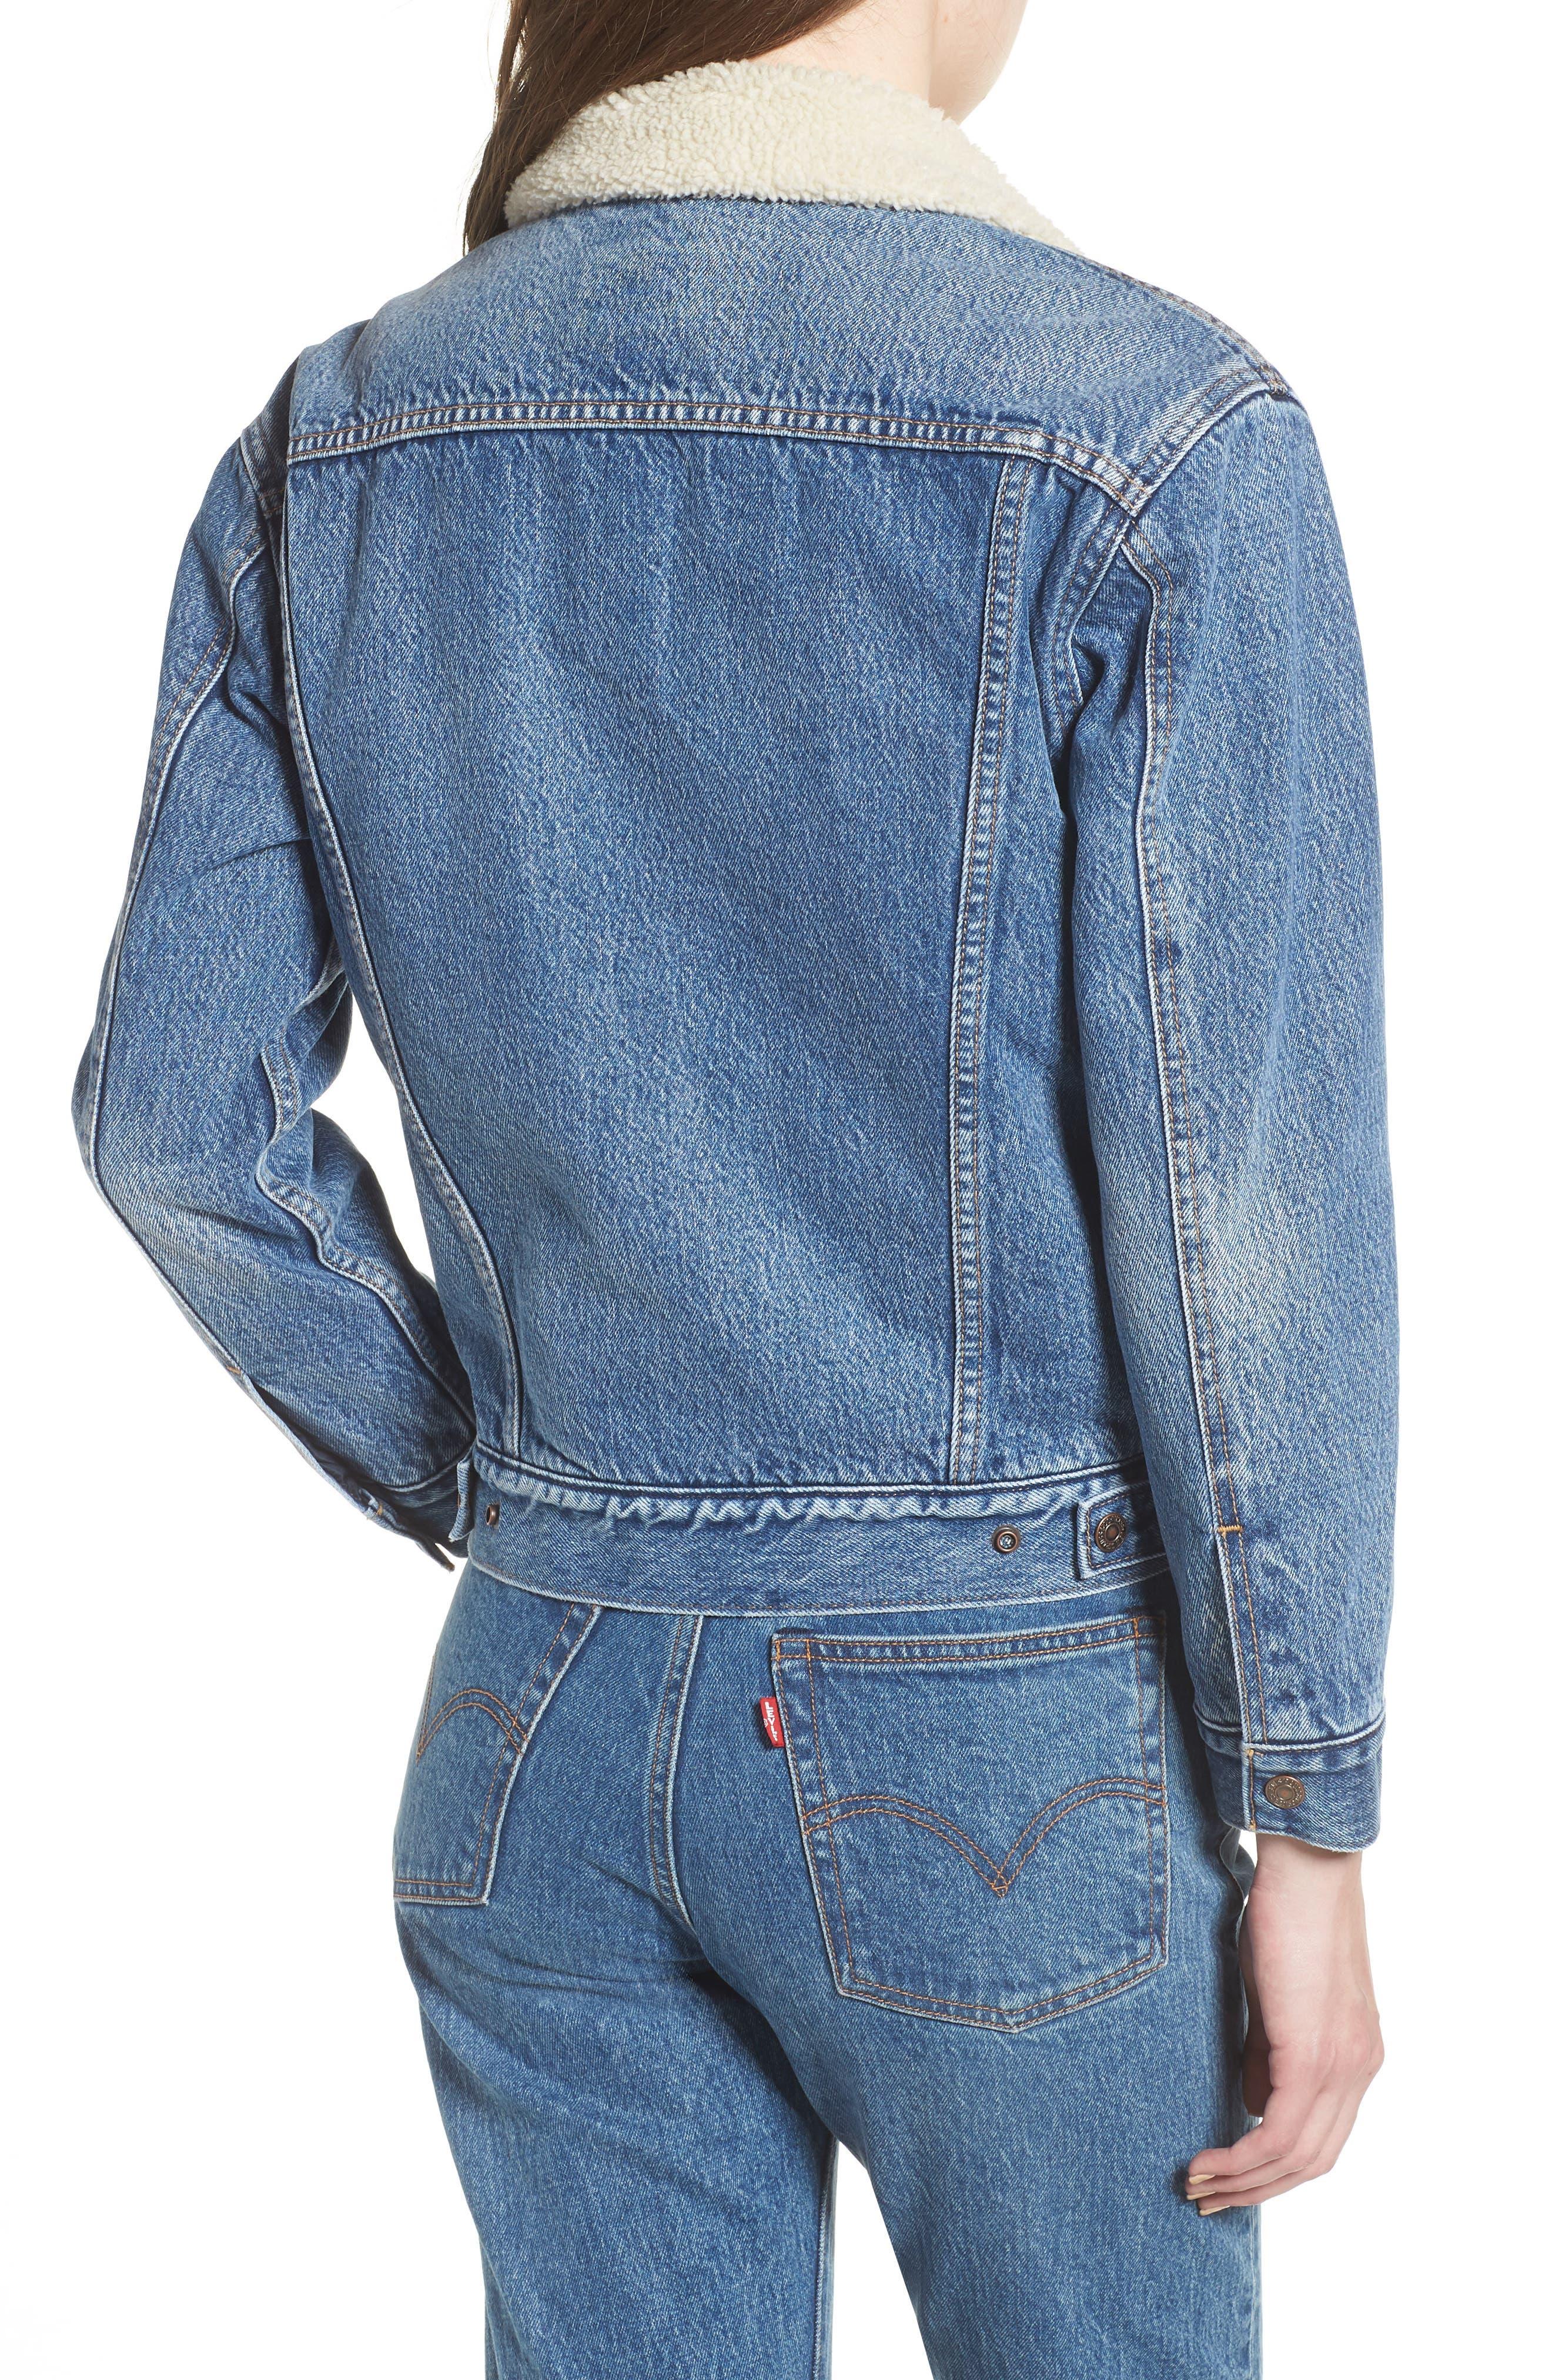 Ex-Boyfriend Fleece Lined Denim Jacket,                             Alternate thumbnail 2, color,                             ADDICTED TO LOVE